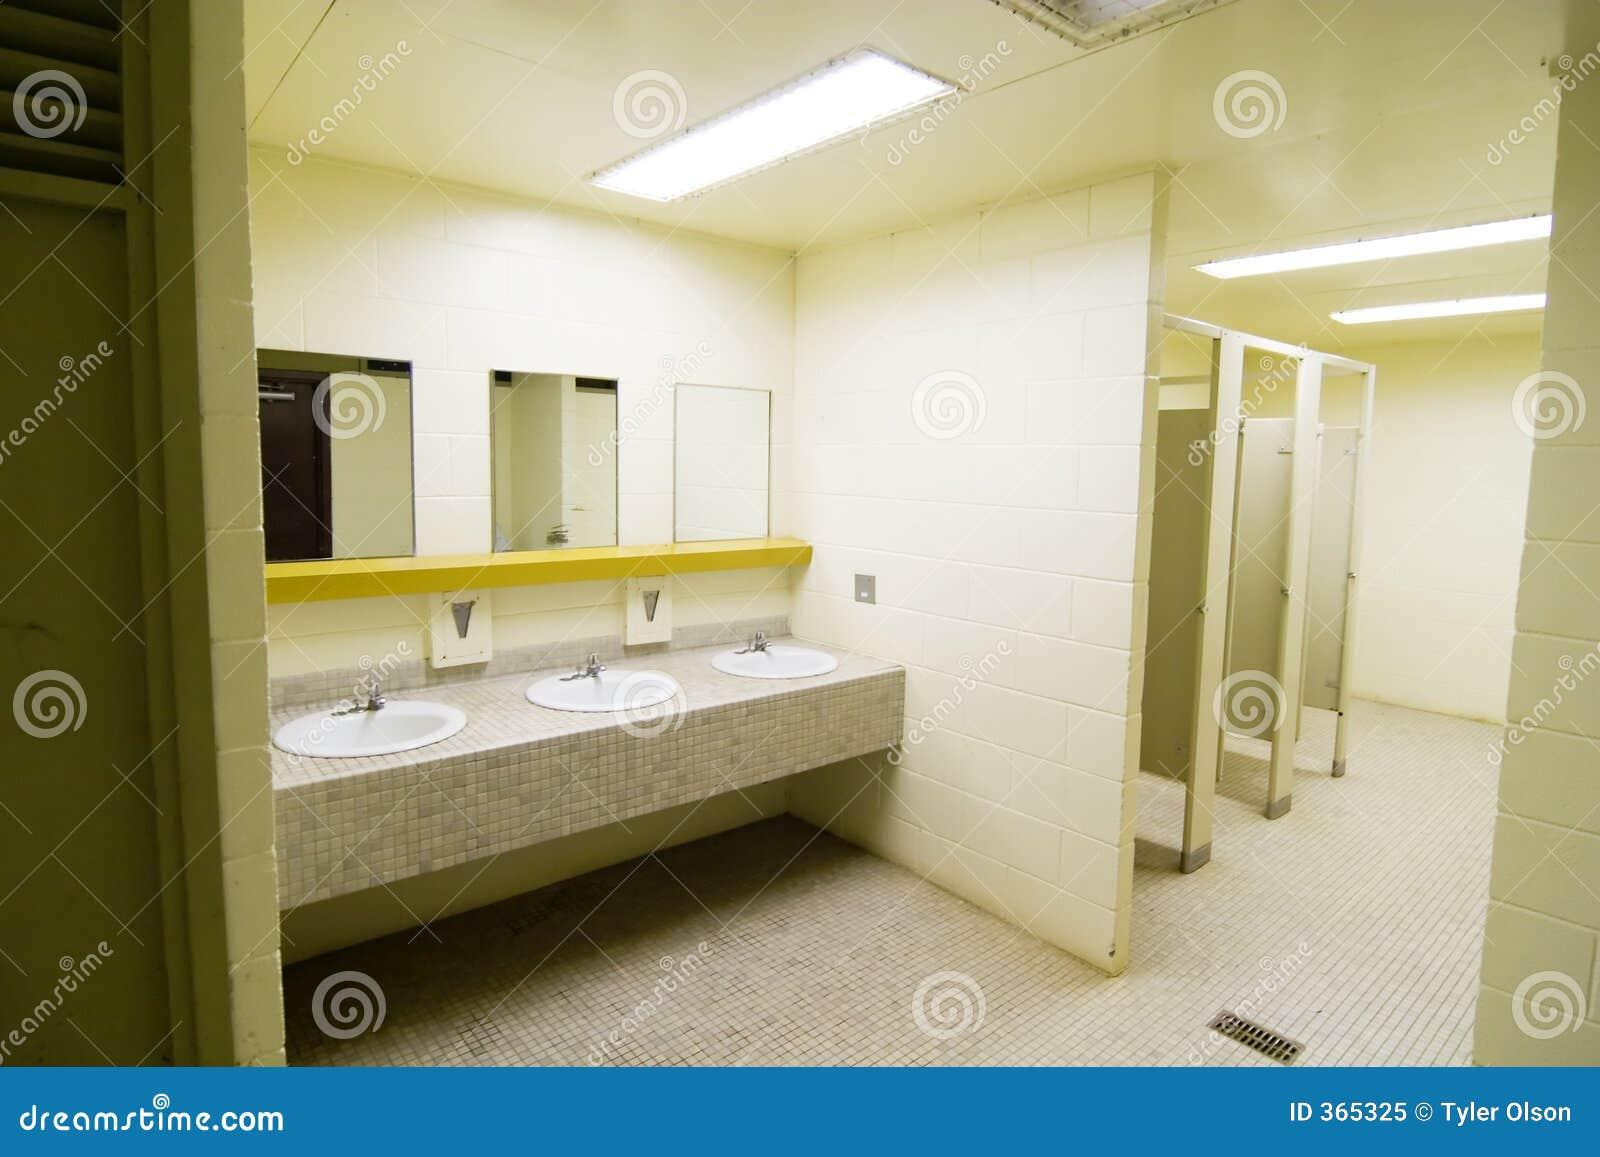 Public Washroom stock image. Image of spring, bathroom - 365325